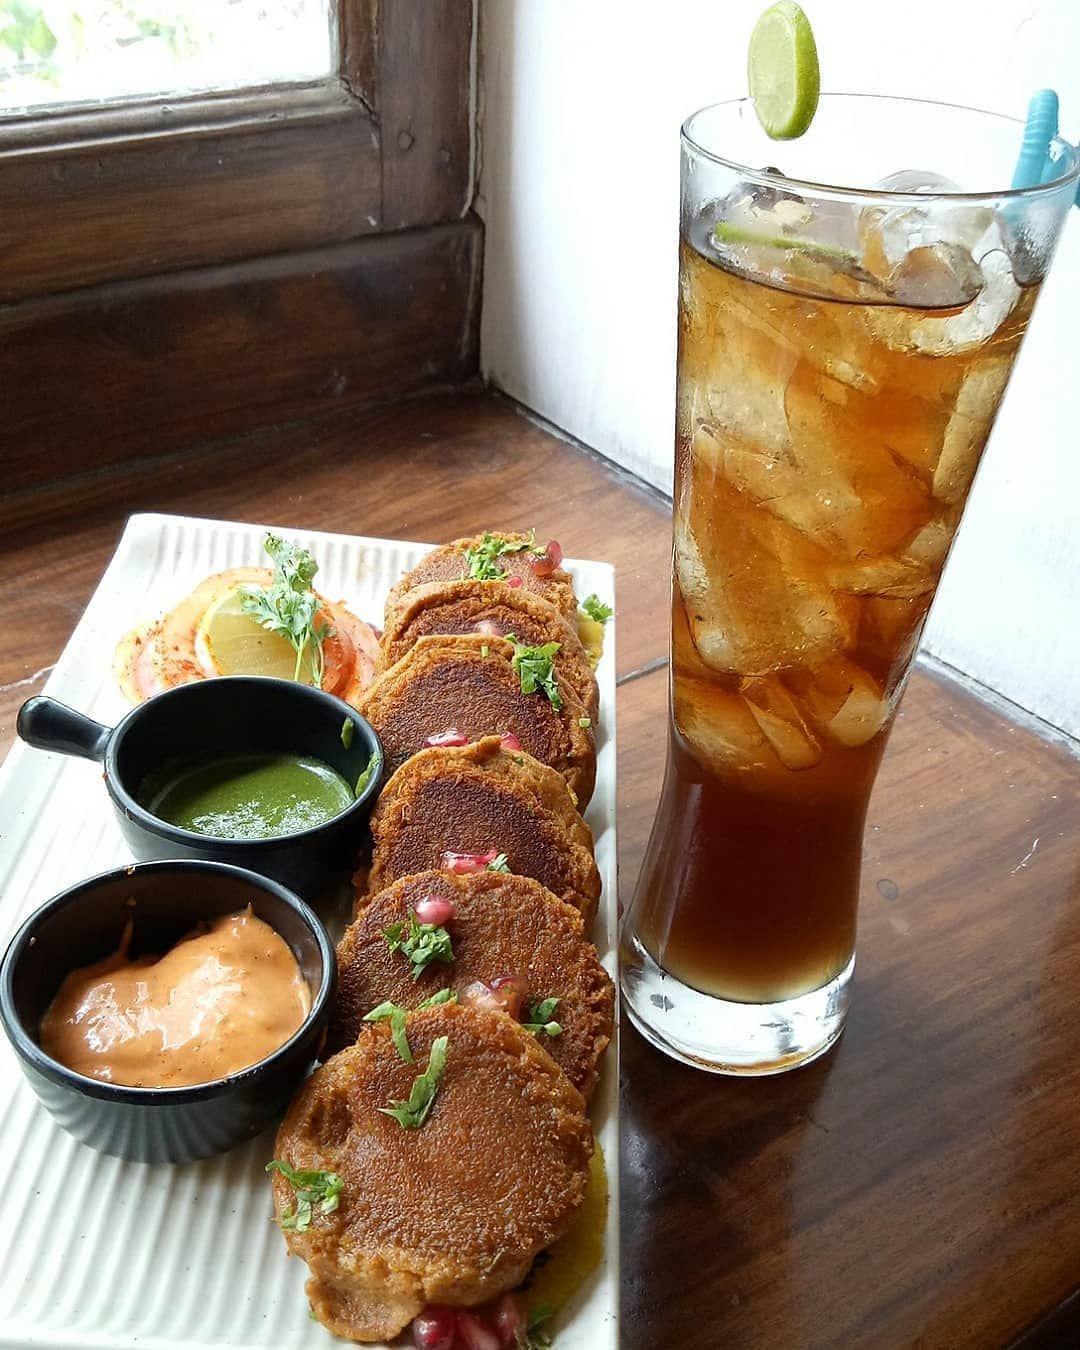 📸 @vegetariansardarji  Saturday weekend with Kebbab and LIIt ♥ 😍 . . . Tag us or use #indianfoodblog...